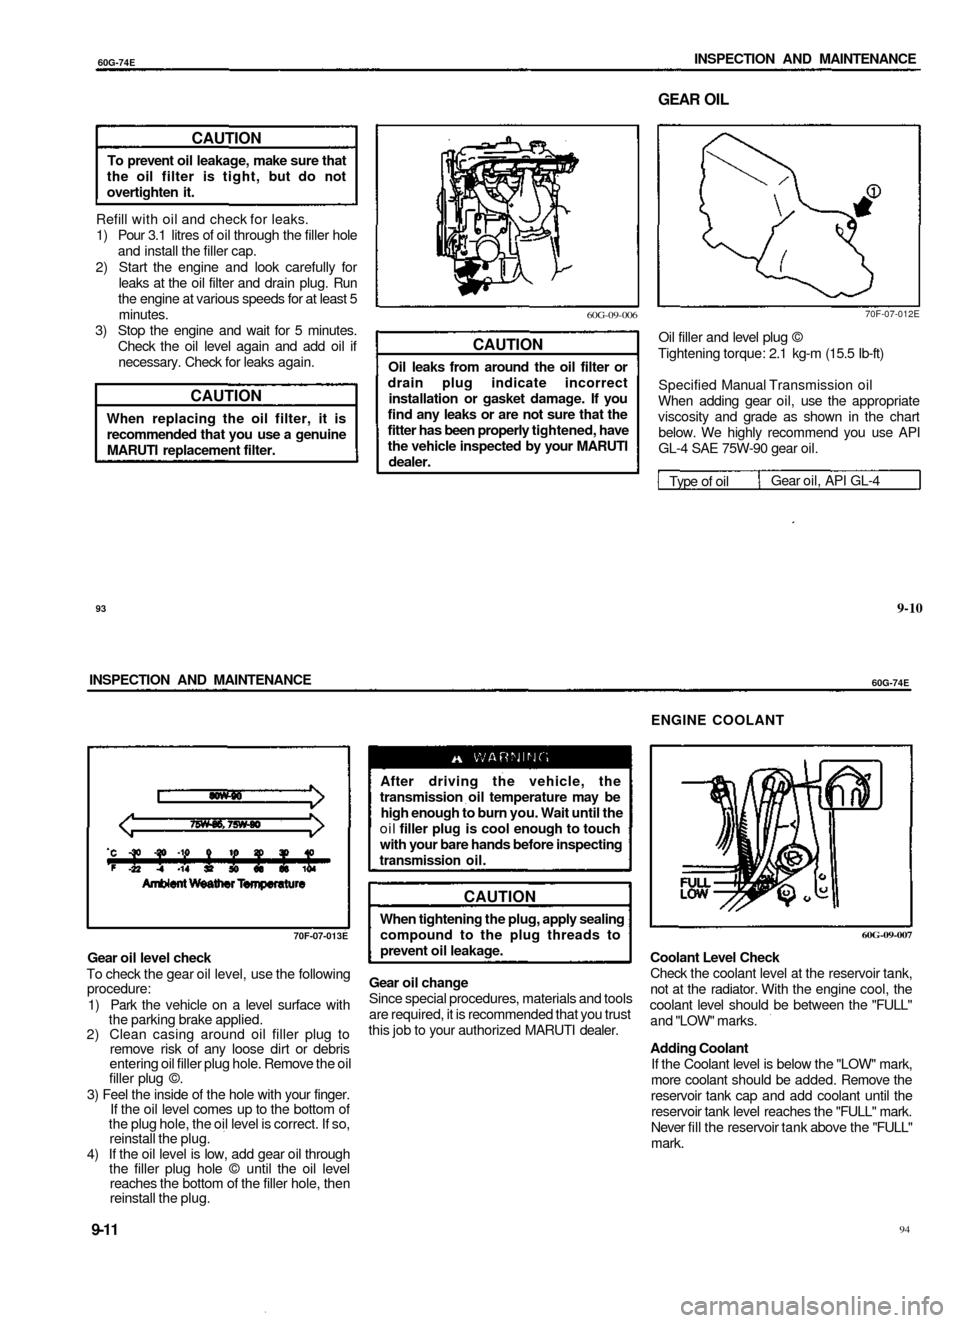 engine coolant SUZUKI BALENO 1999 1.G Owners Manual